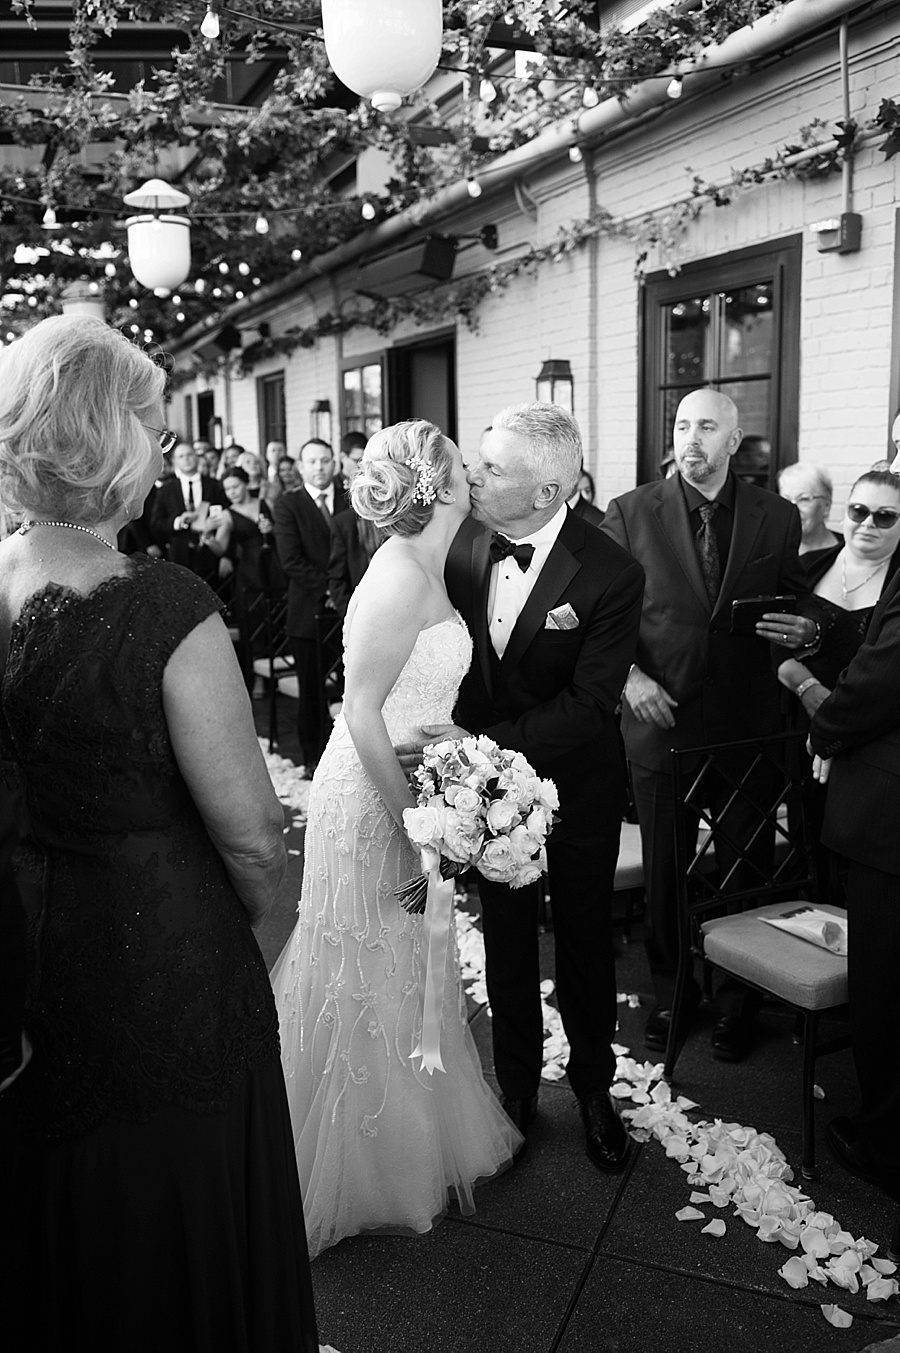 Gramercy_Park_Hotel_Wedding_027.jpg